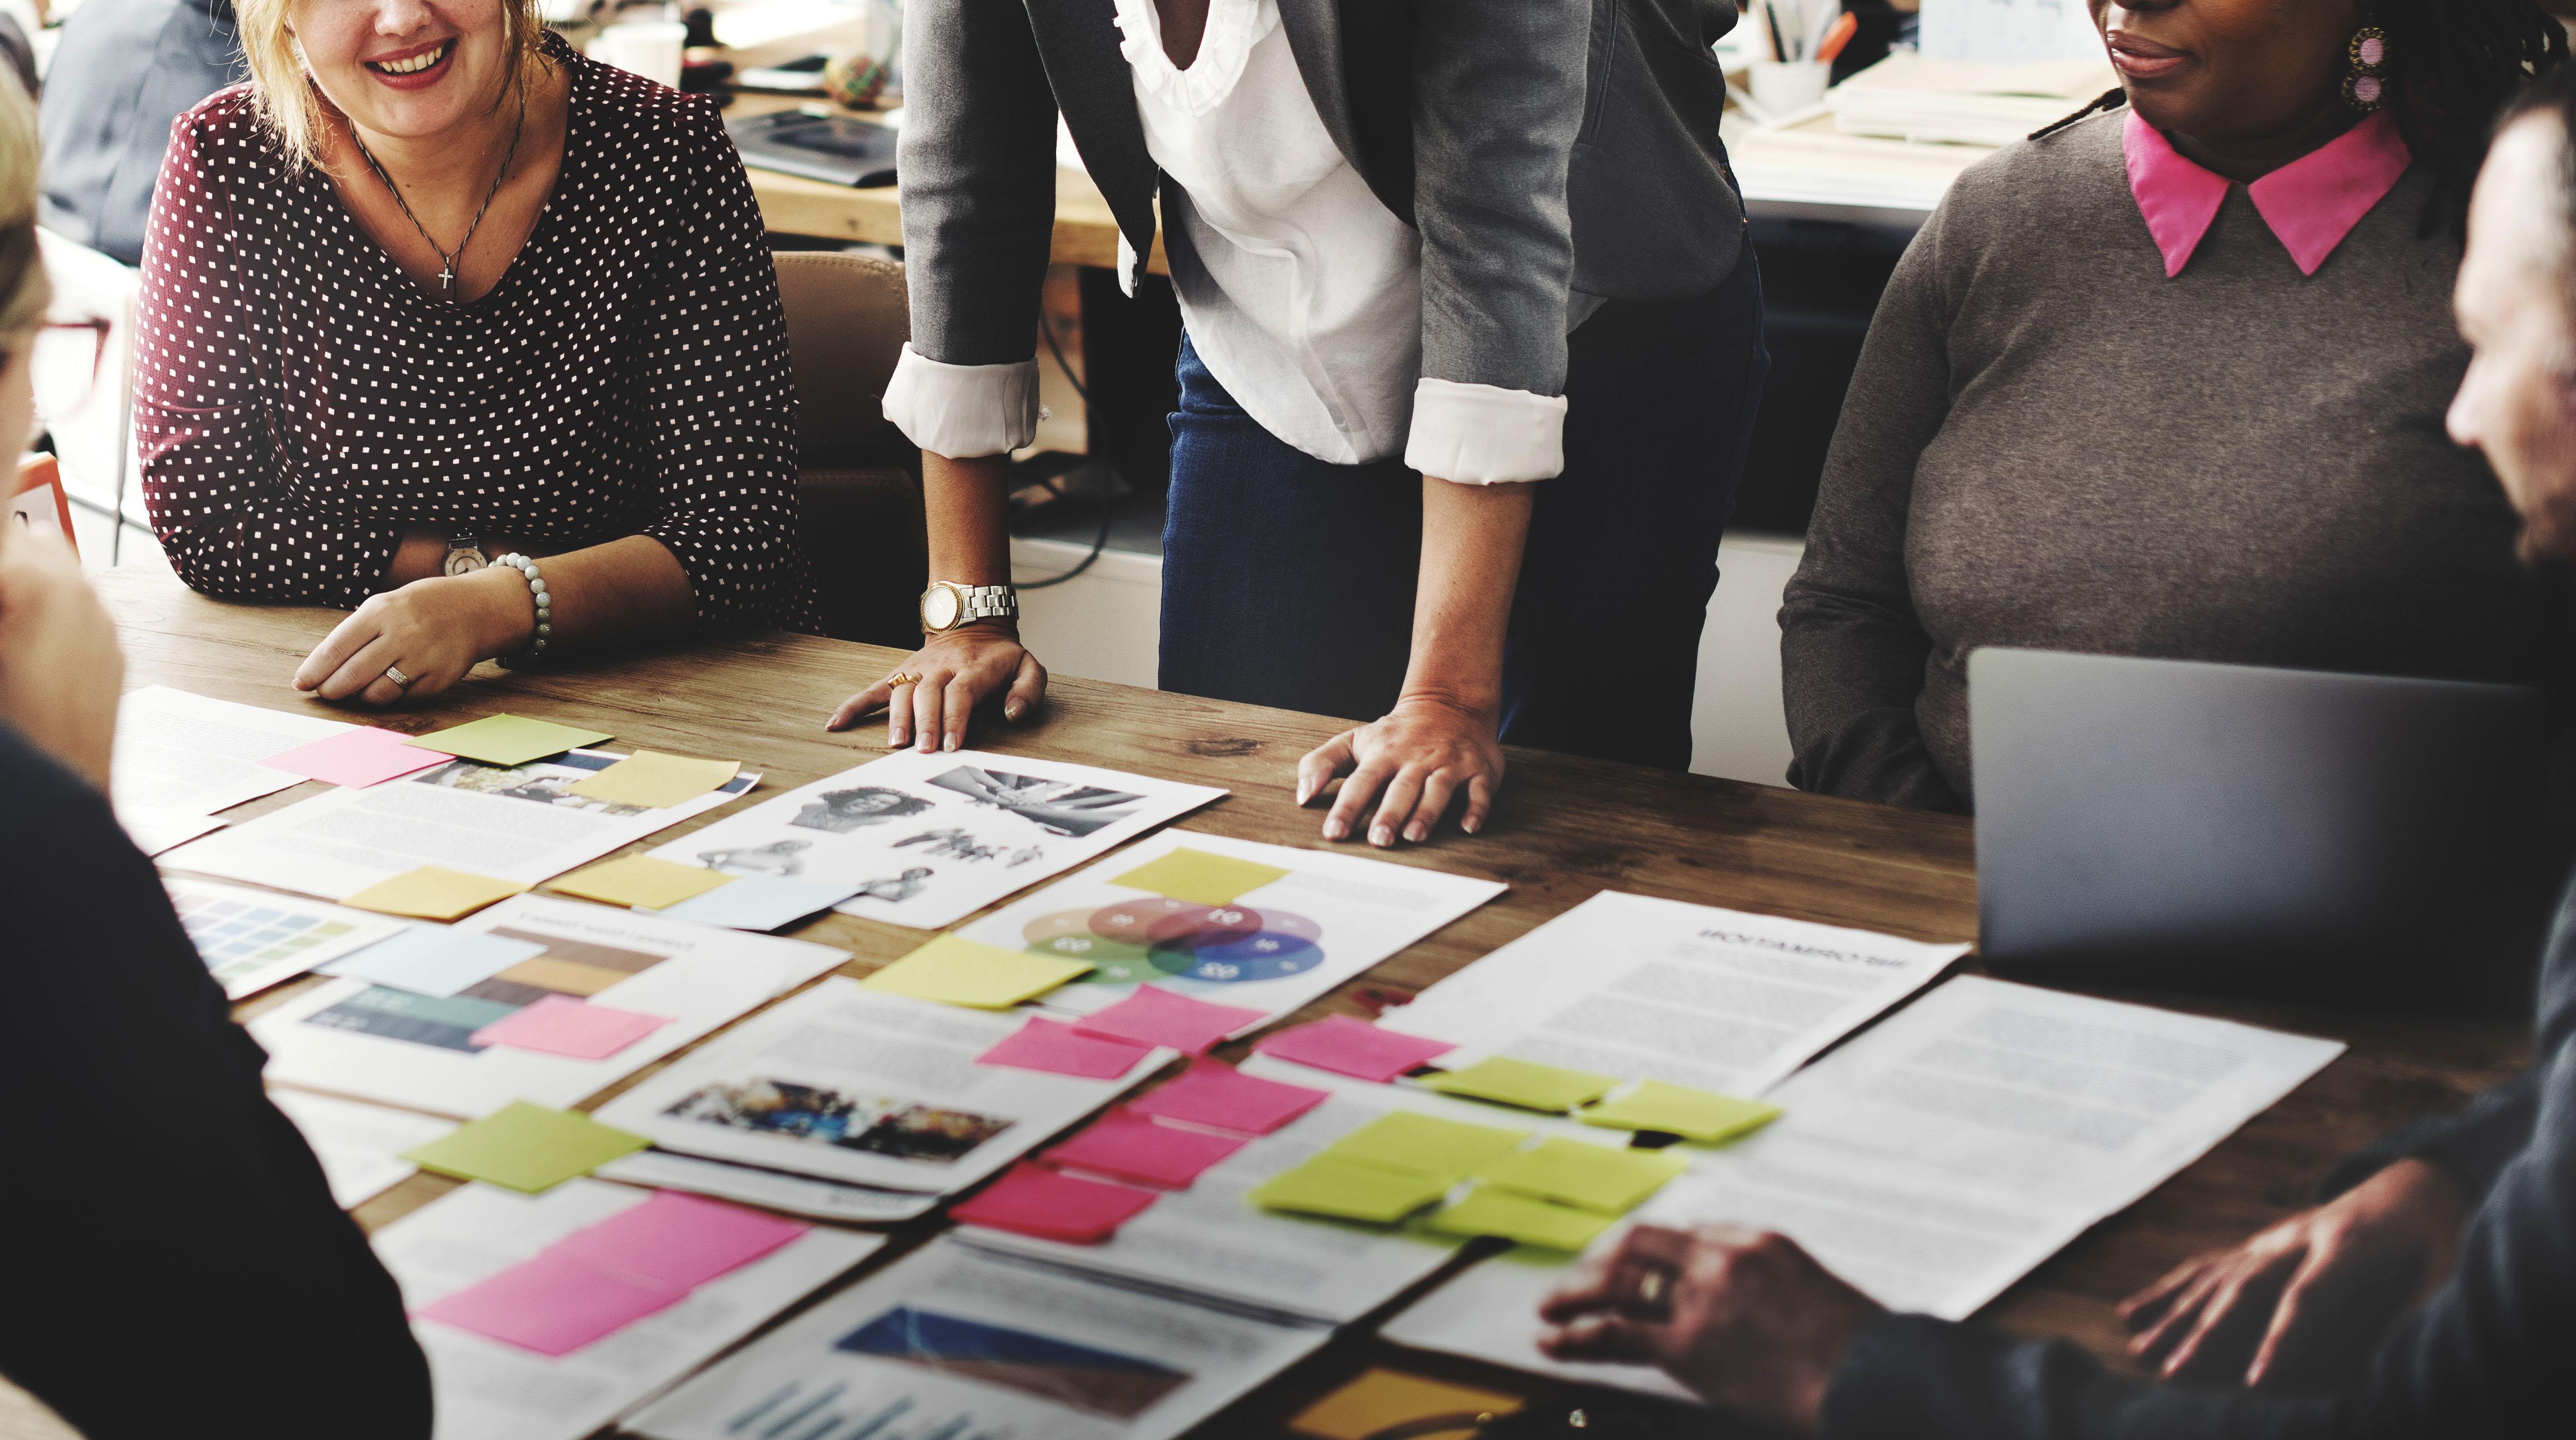 ksa professional development assessment for organizations